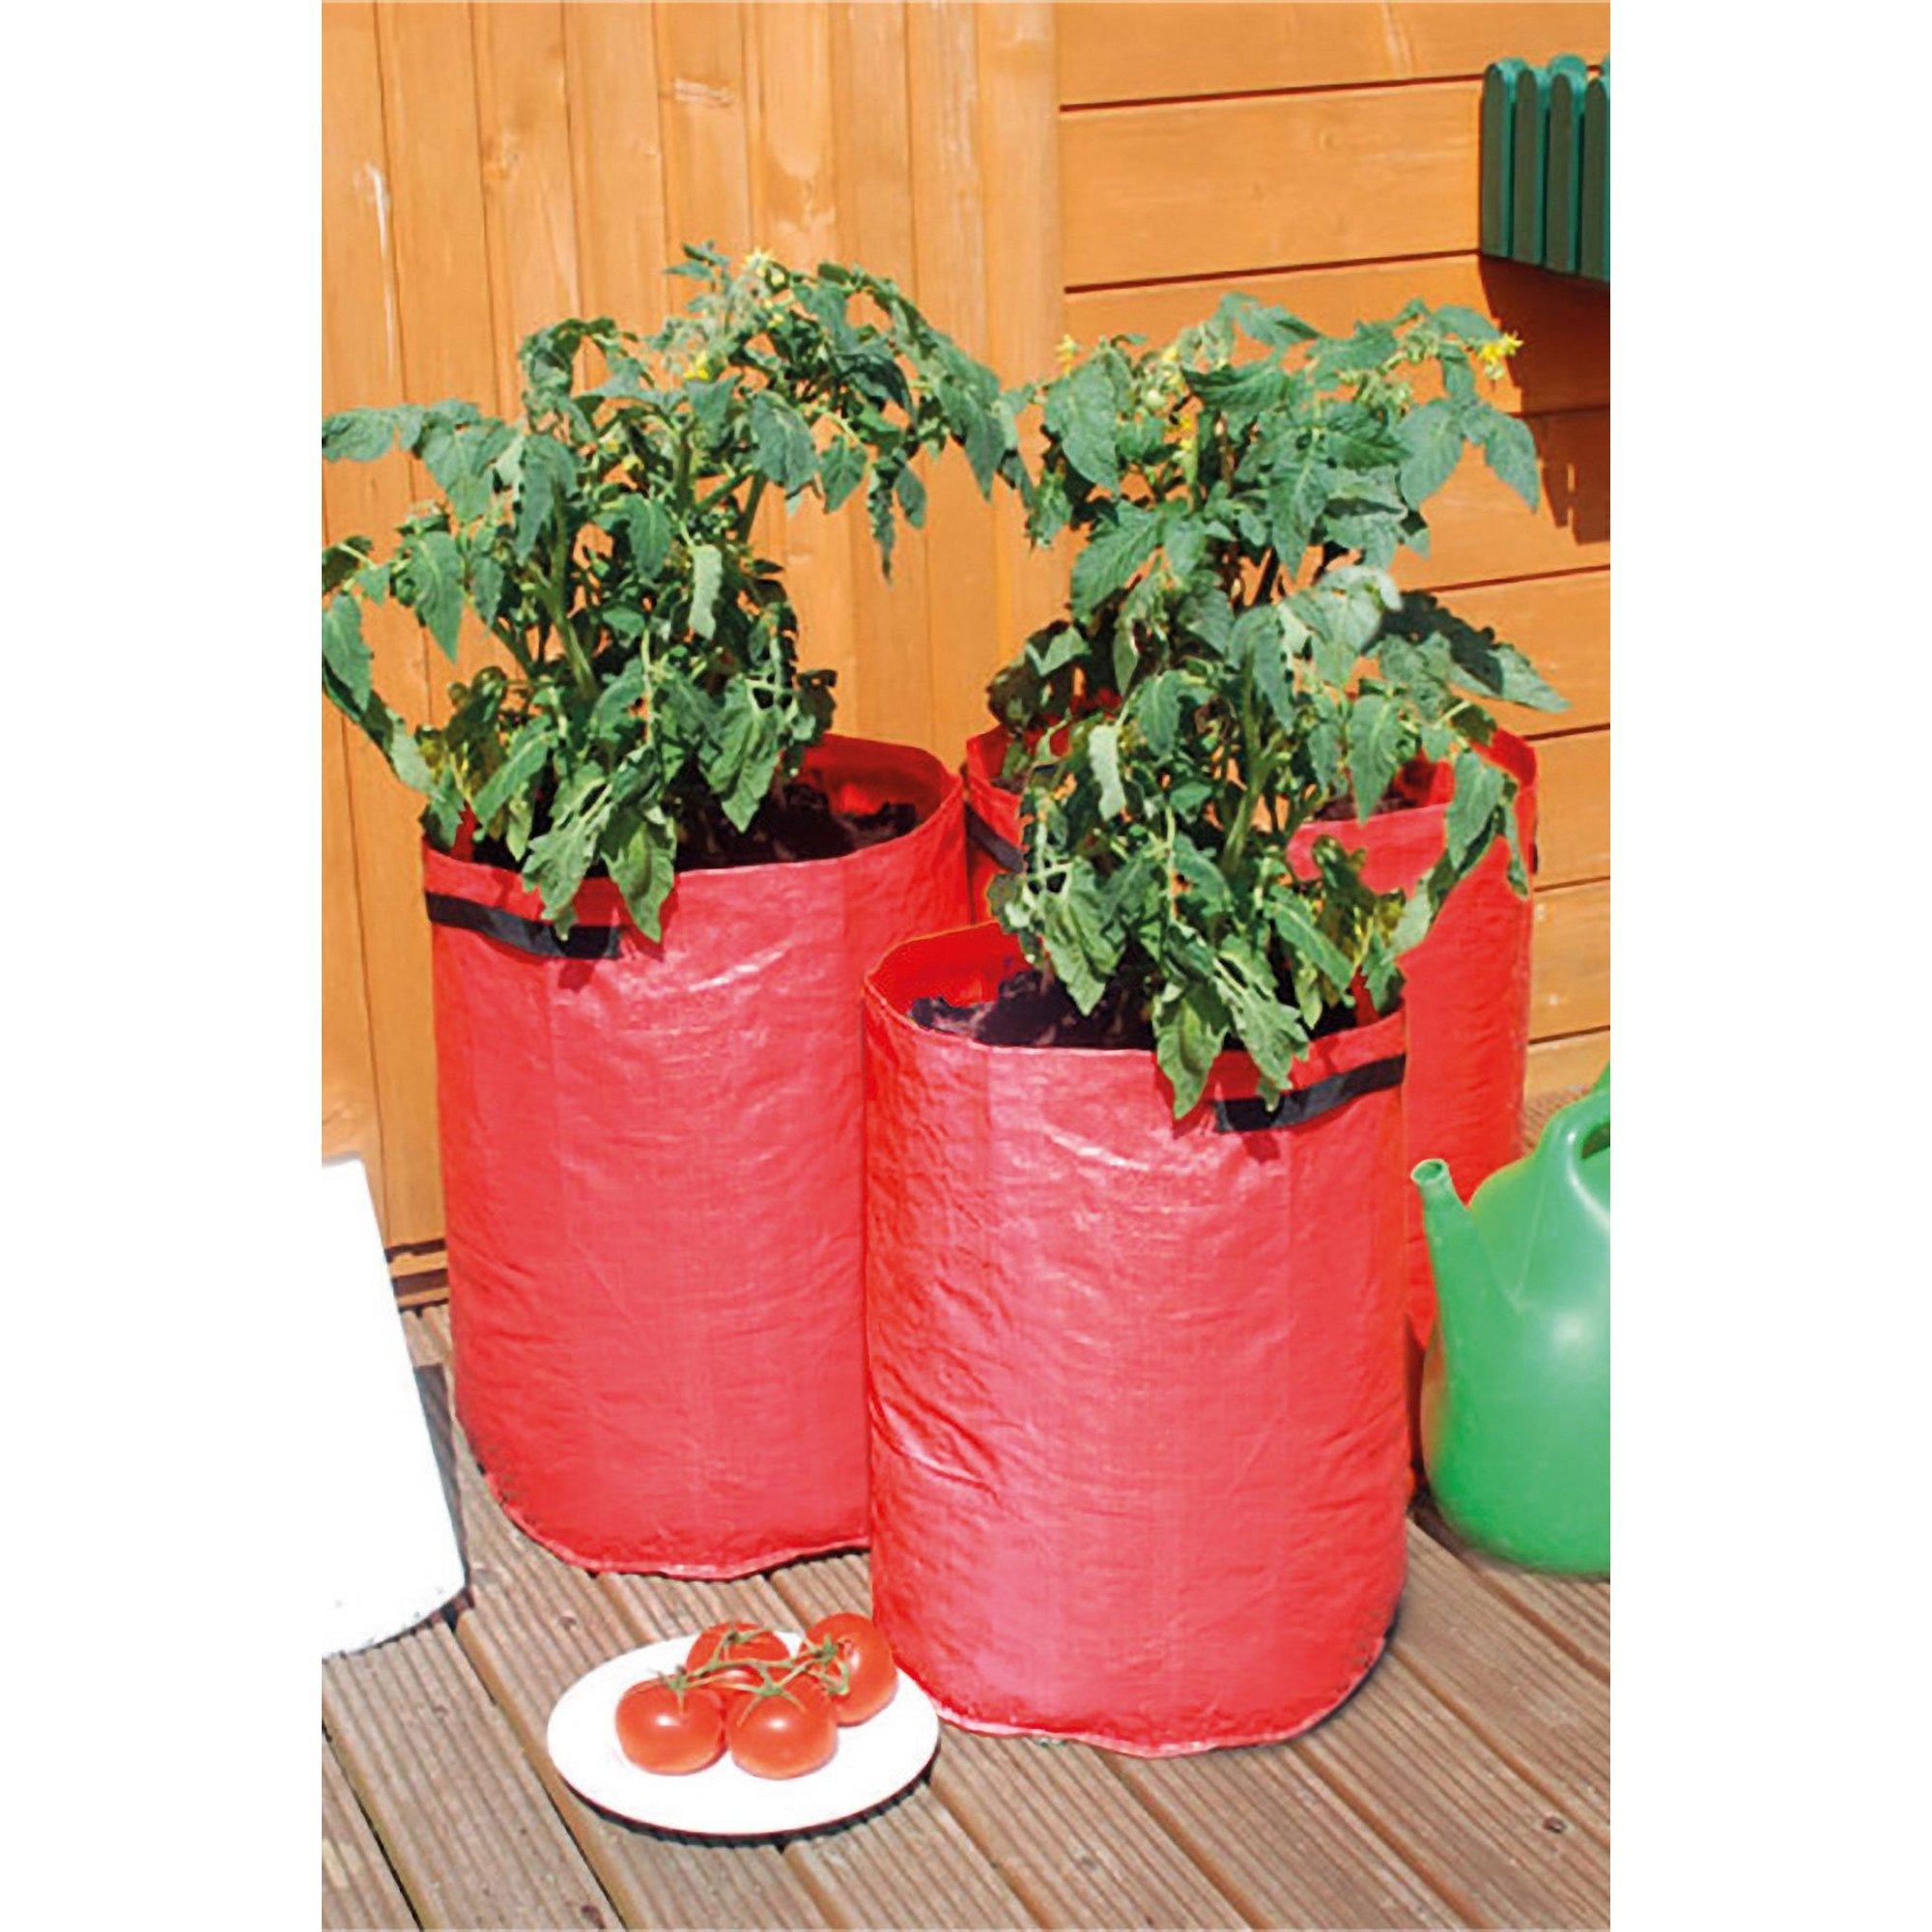 Image of 3 Tomato Grow Bags